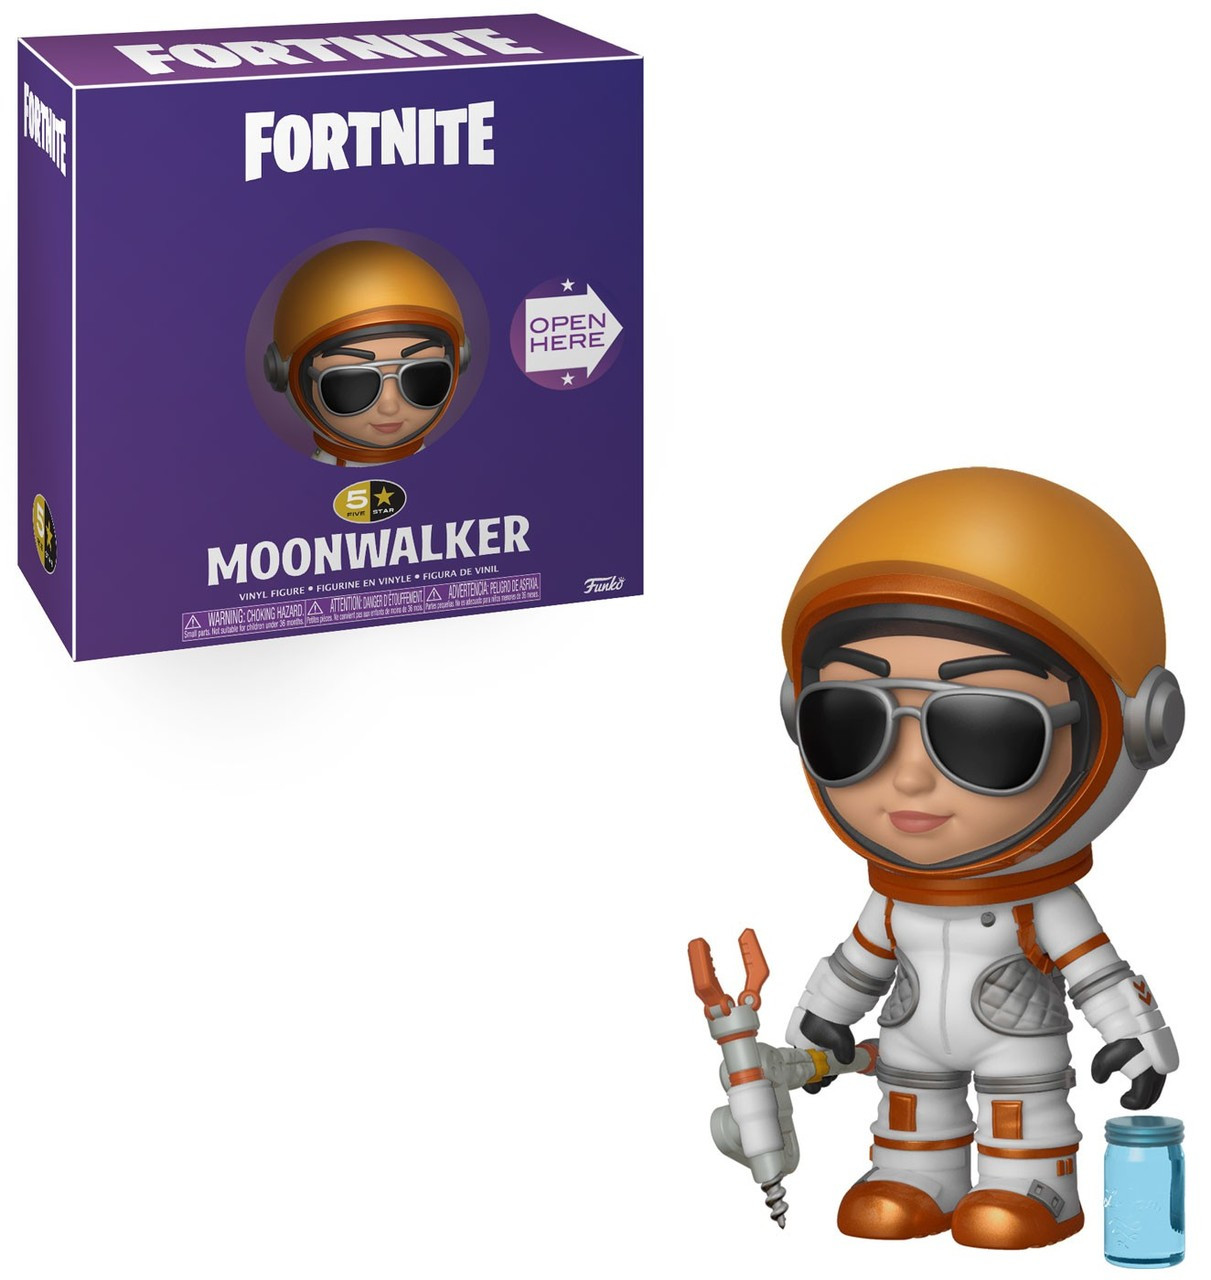 6888c95b124 Funko Fortnite Funko 5 Star Moonwalker Vinyl Figure With Slurp Juice -  ToyWiz